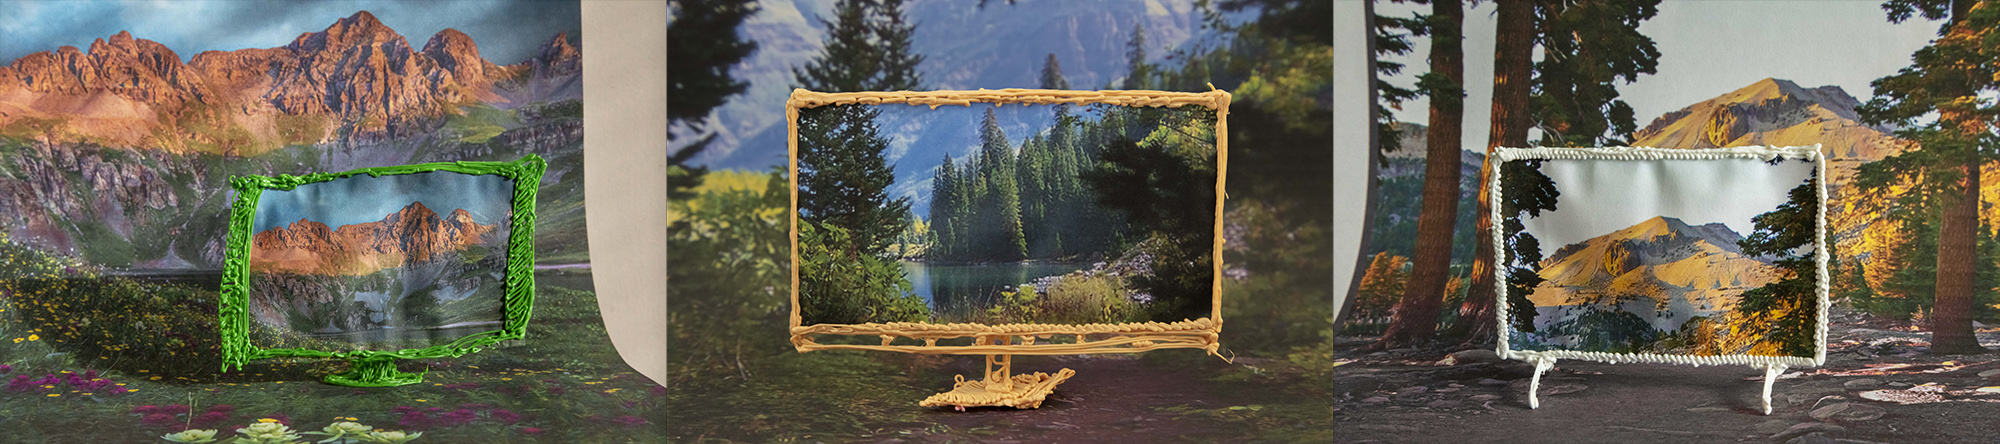 Jiaqi Li - Our TV